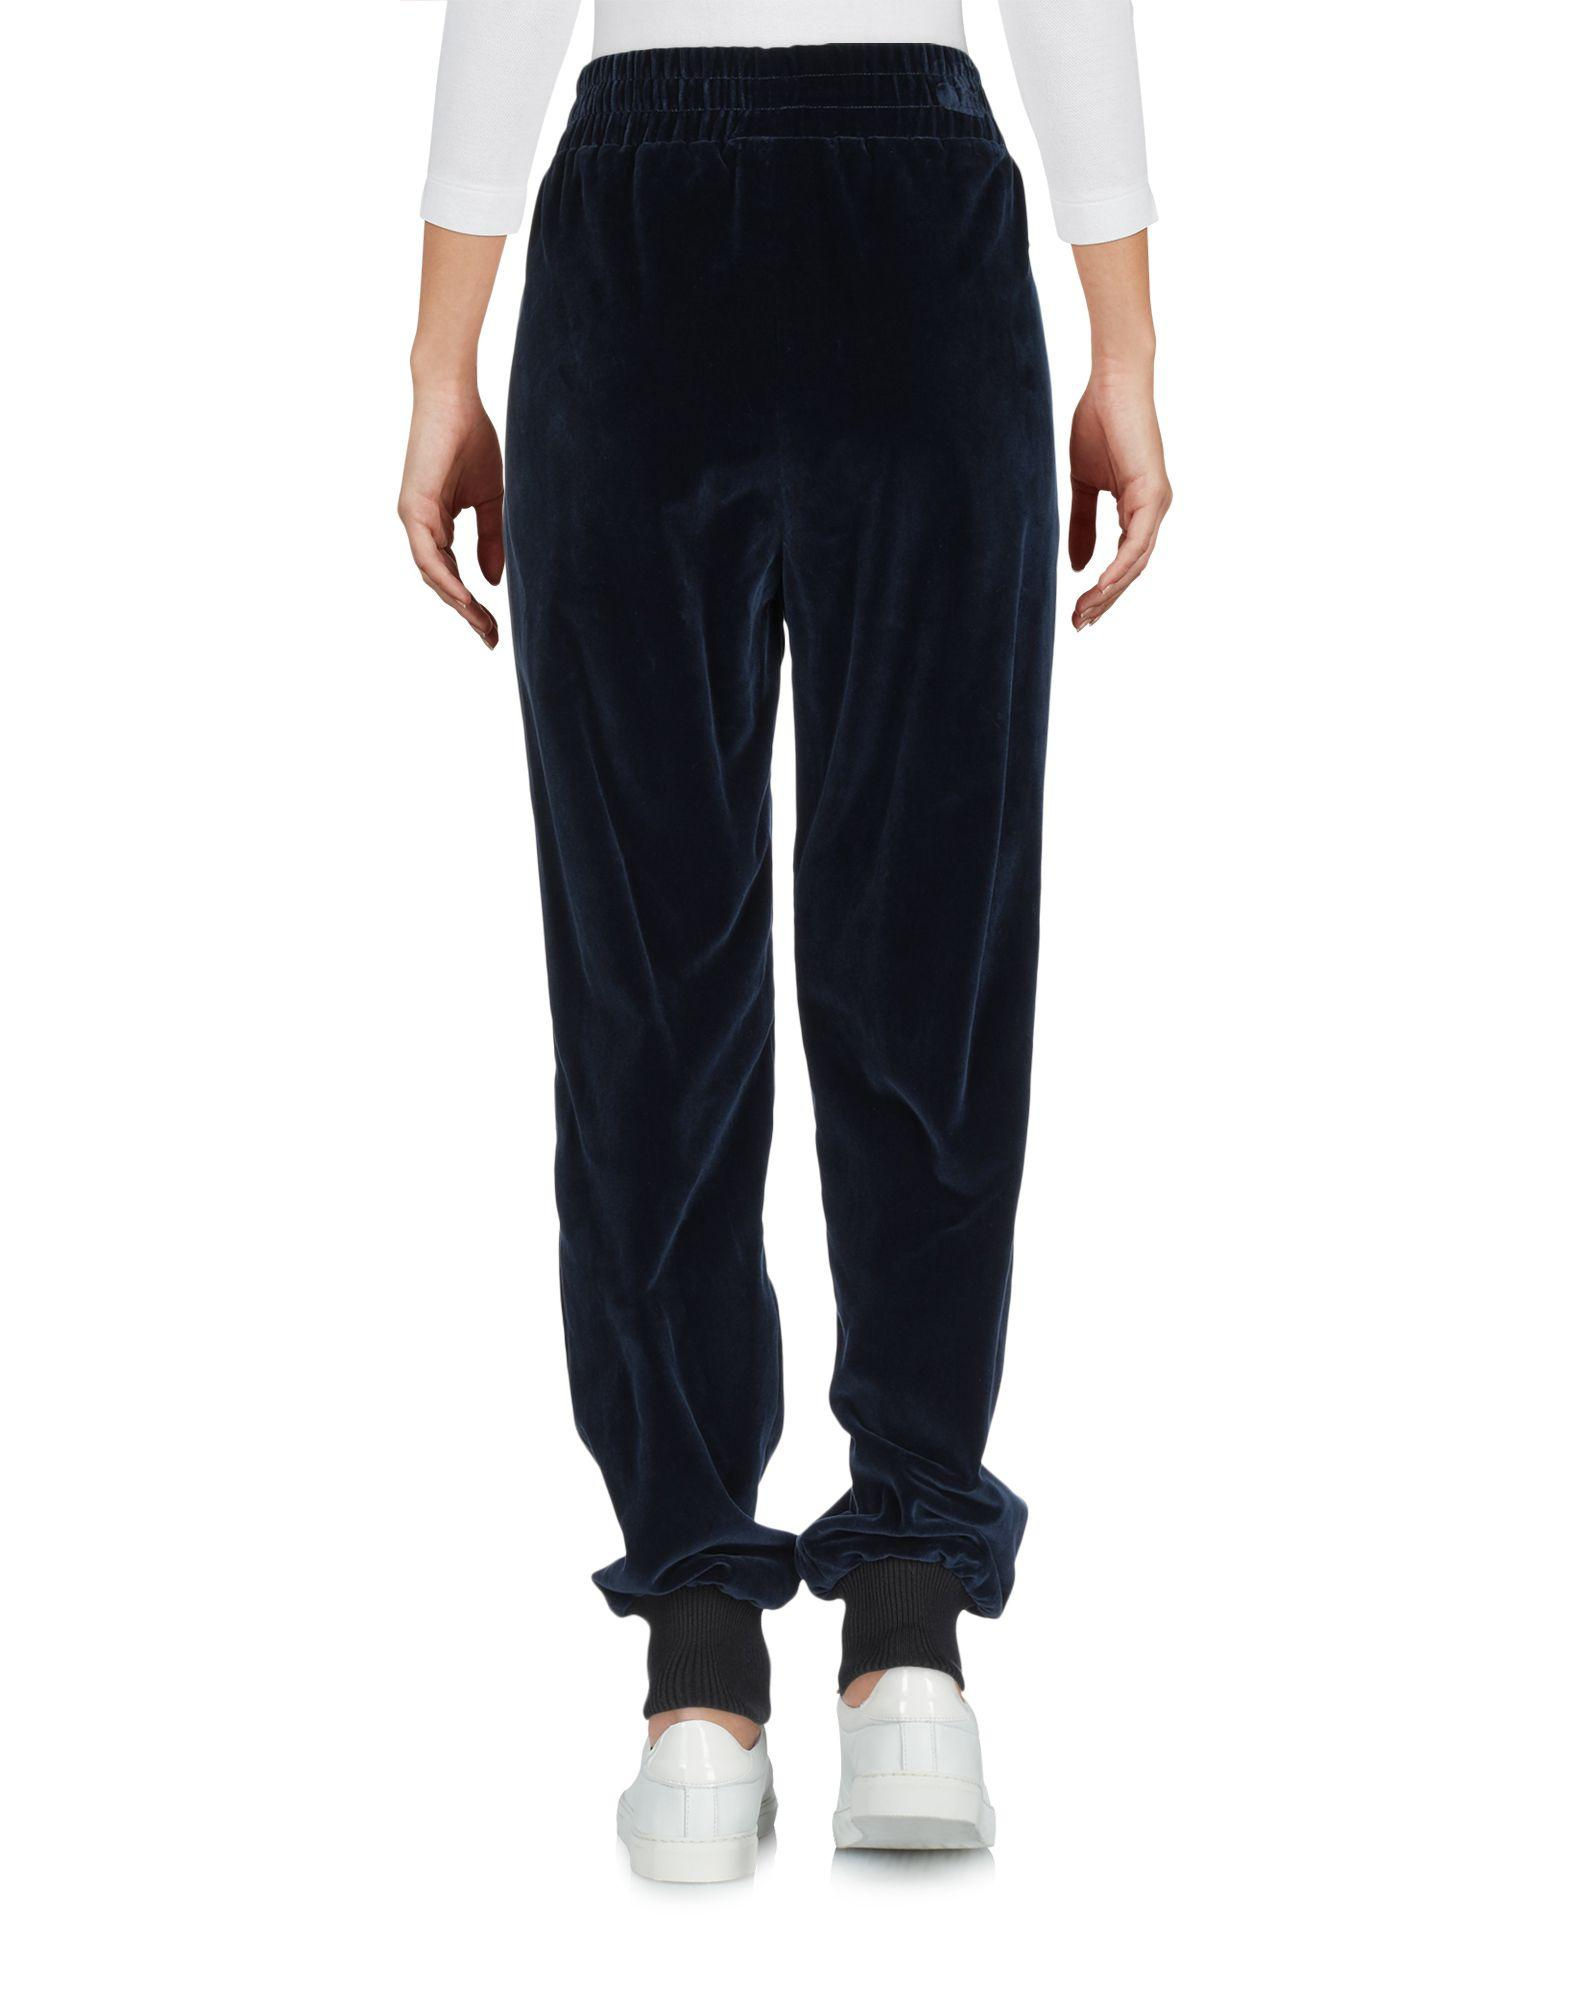 Pantalones Dolce & Gabbana de Algodón de color Azul